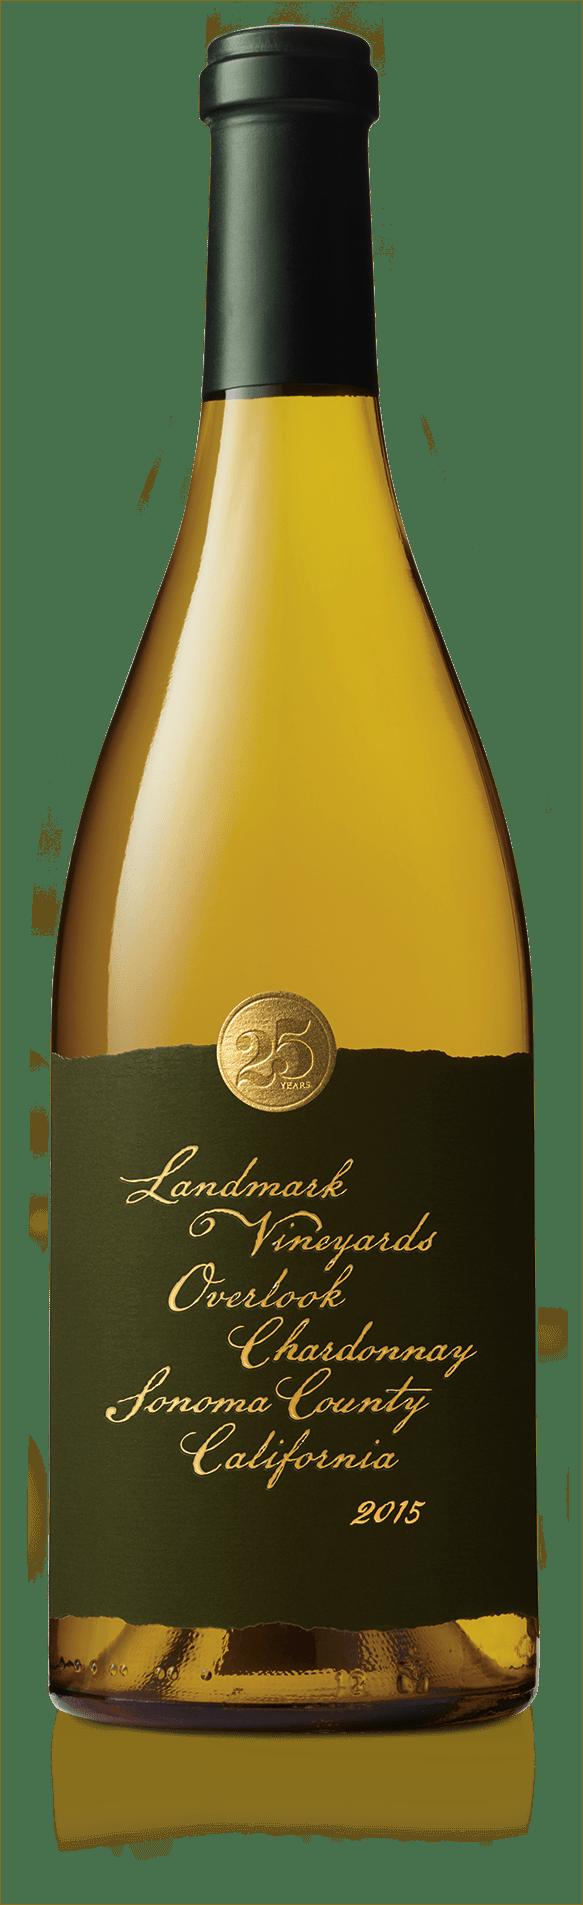 2011 Landmark Vineyards Overlook Chardonnay Sonoma County